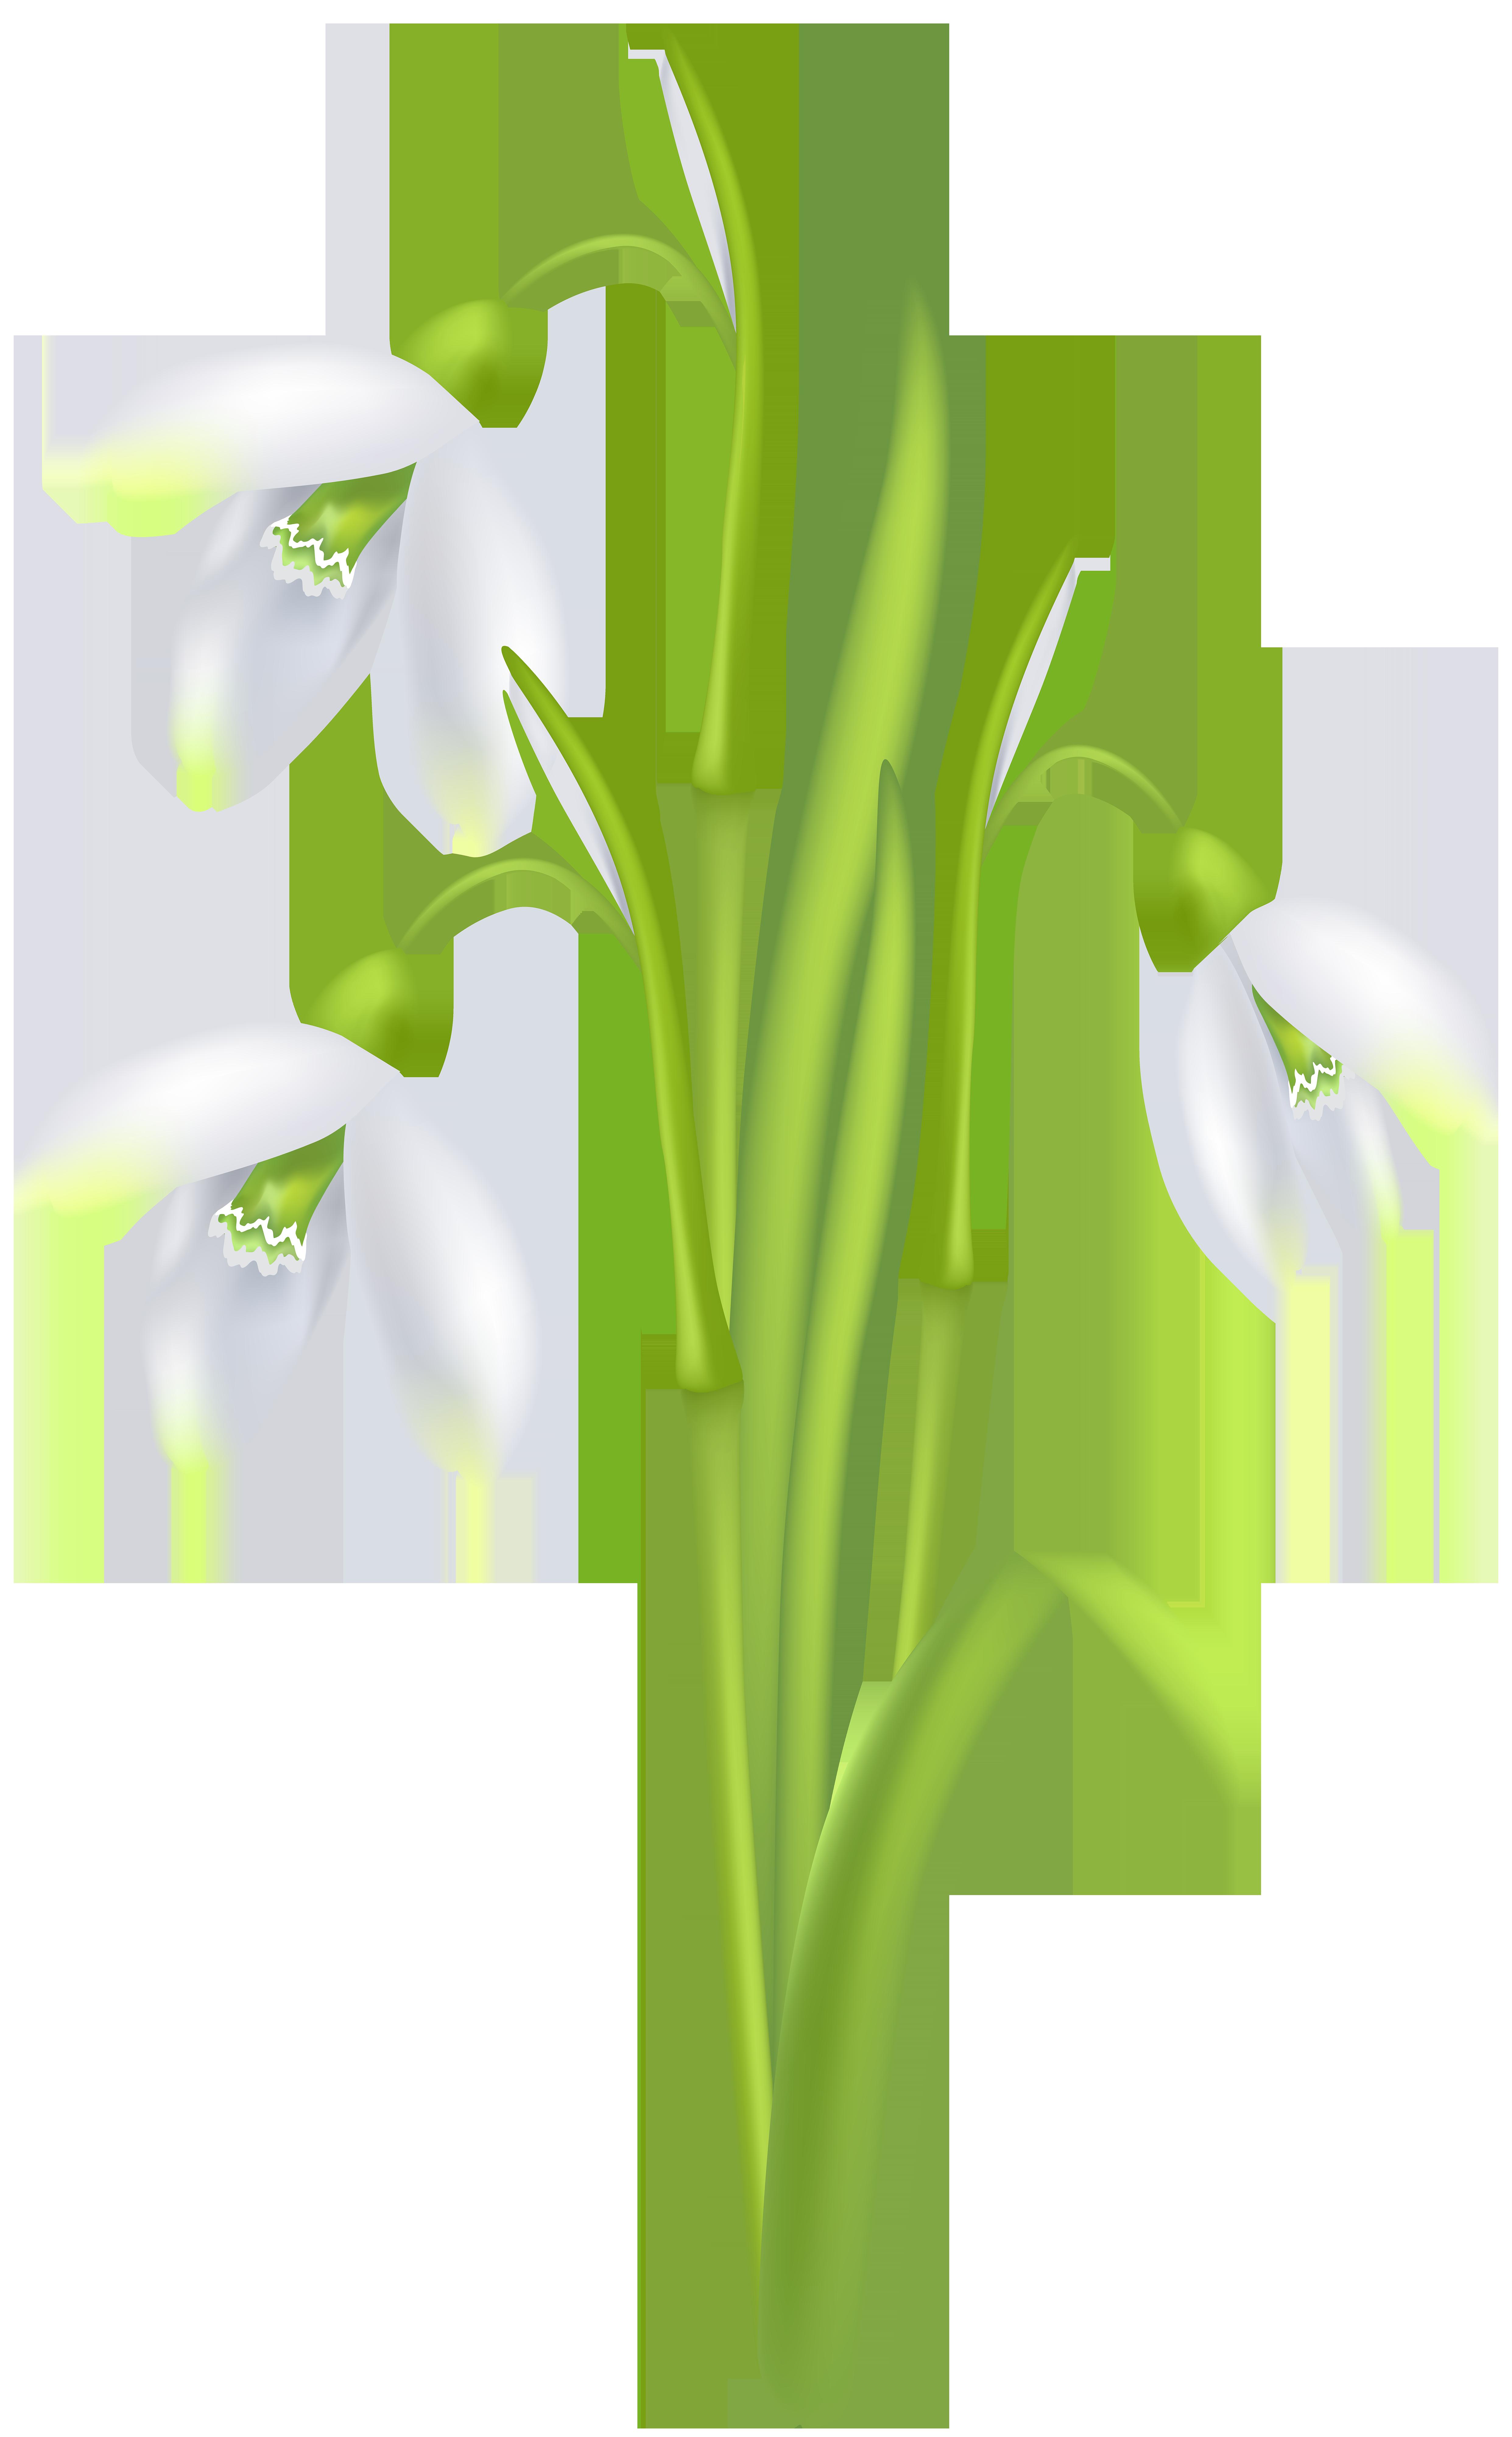 Snowdrop Flower Transparent Image.